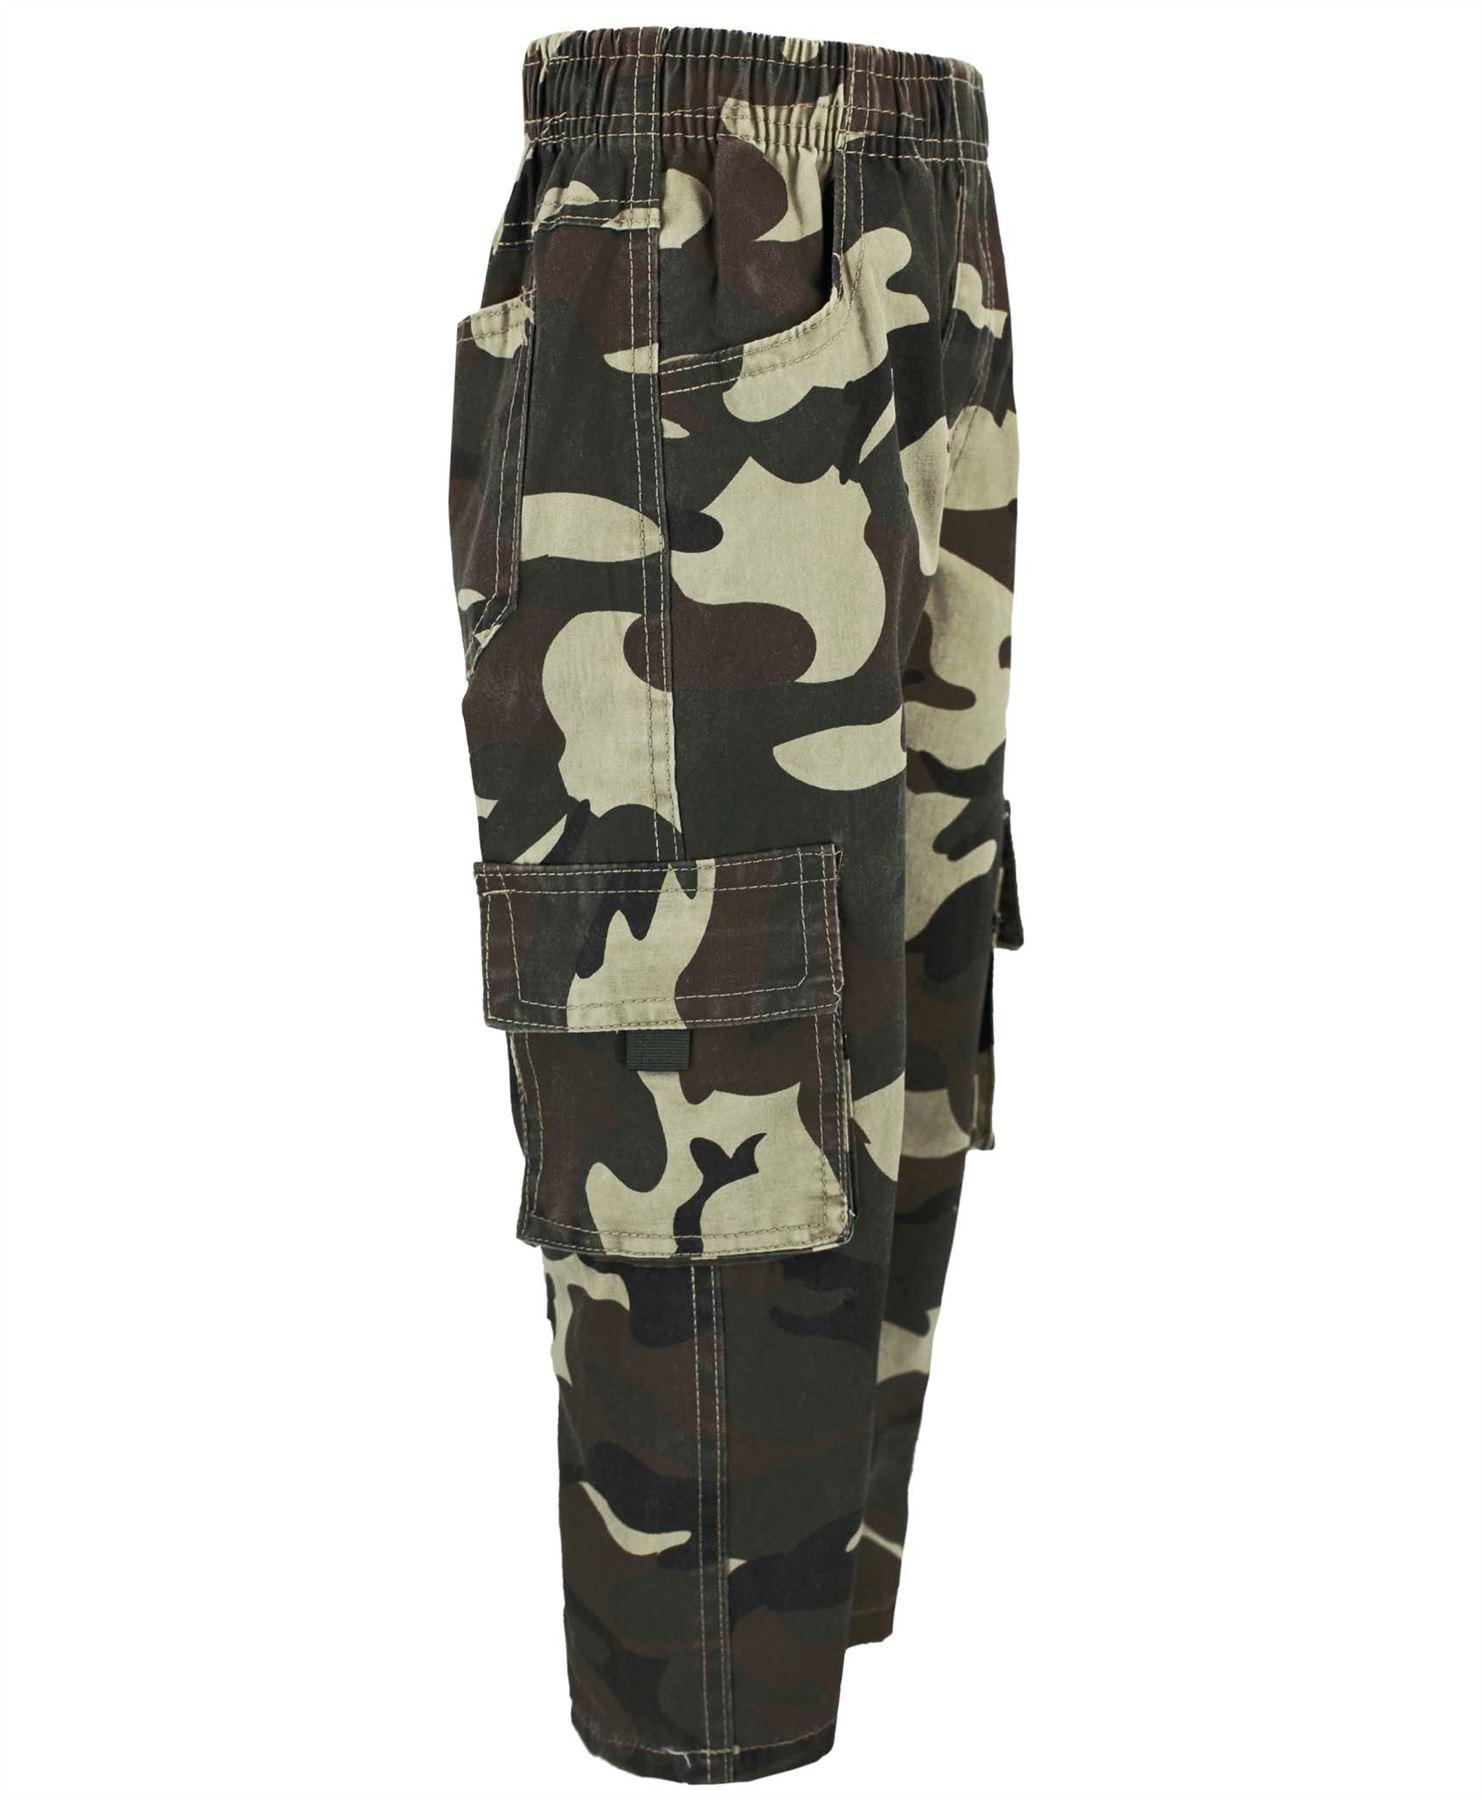 Kids-multipocket-camouflage-pantalon-garcons-armee-imprimer-cargo-combat-pantalon-4-14-ans miniature 6